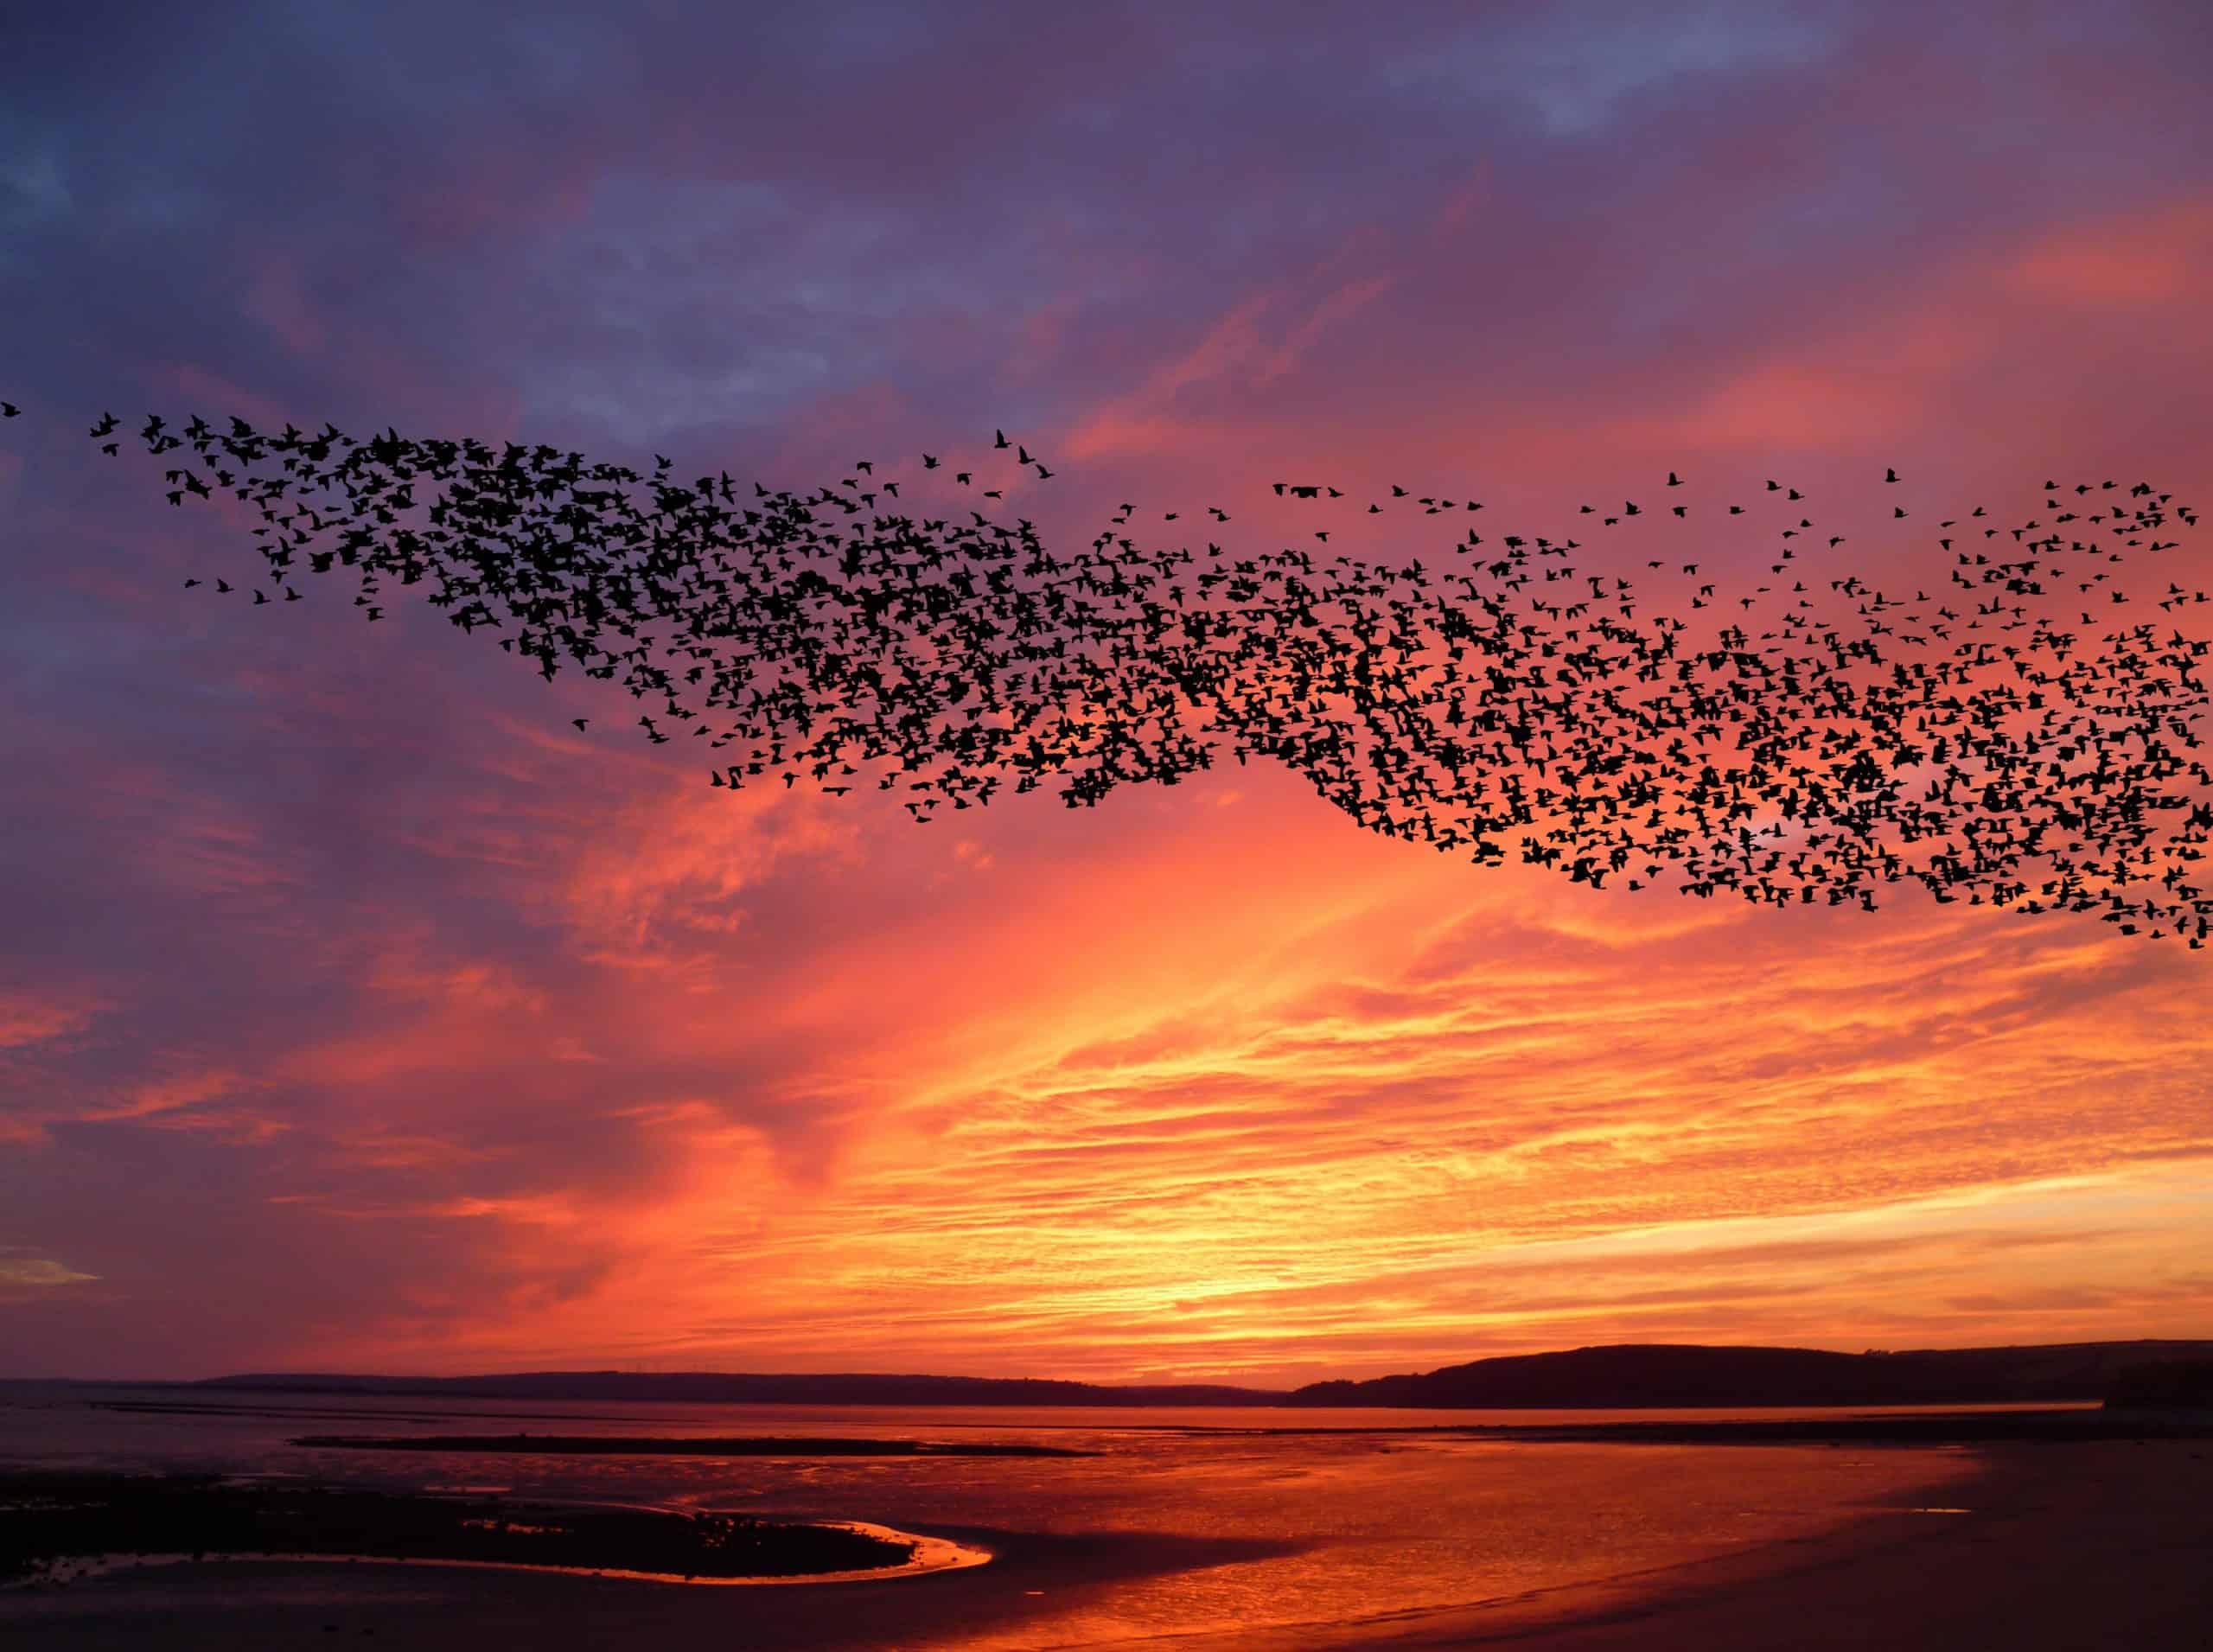 mumuration, flocking birds, sunset and blackbirds